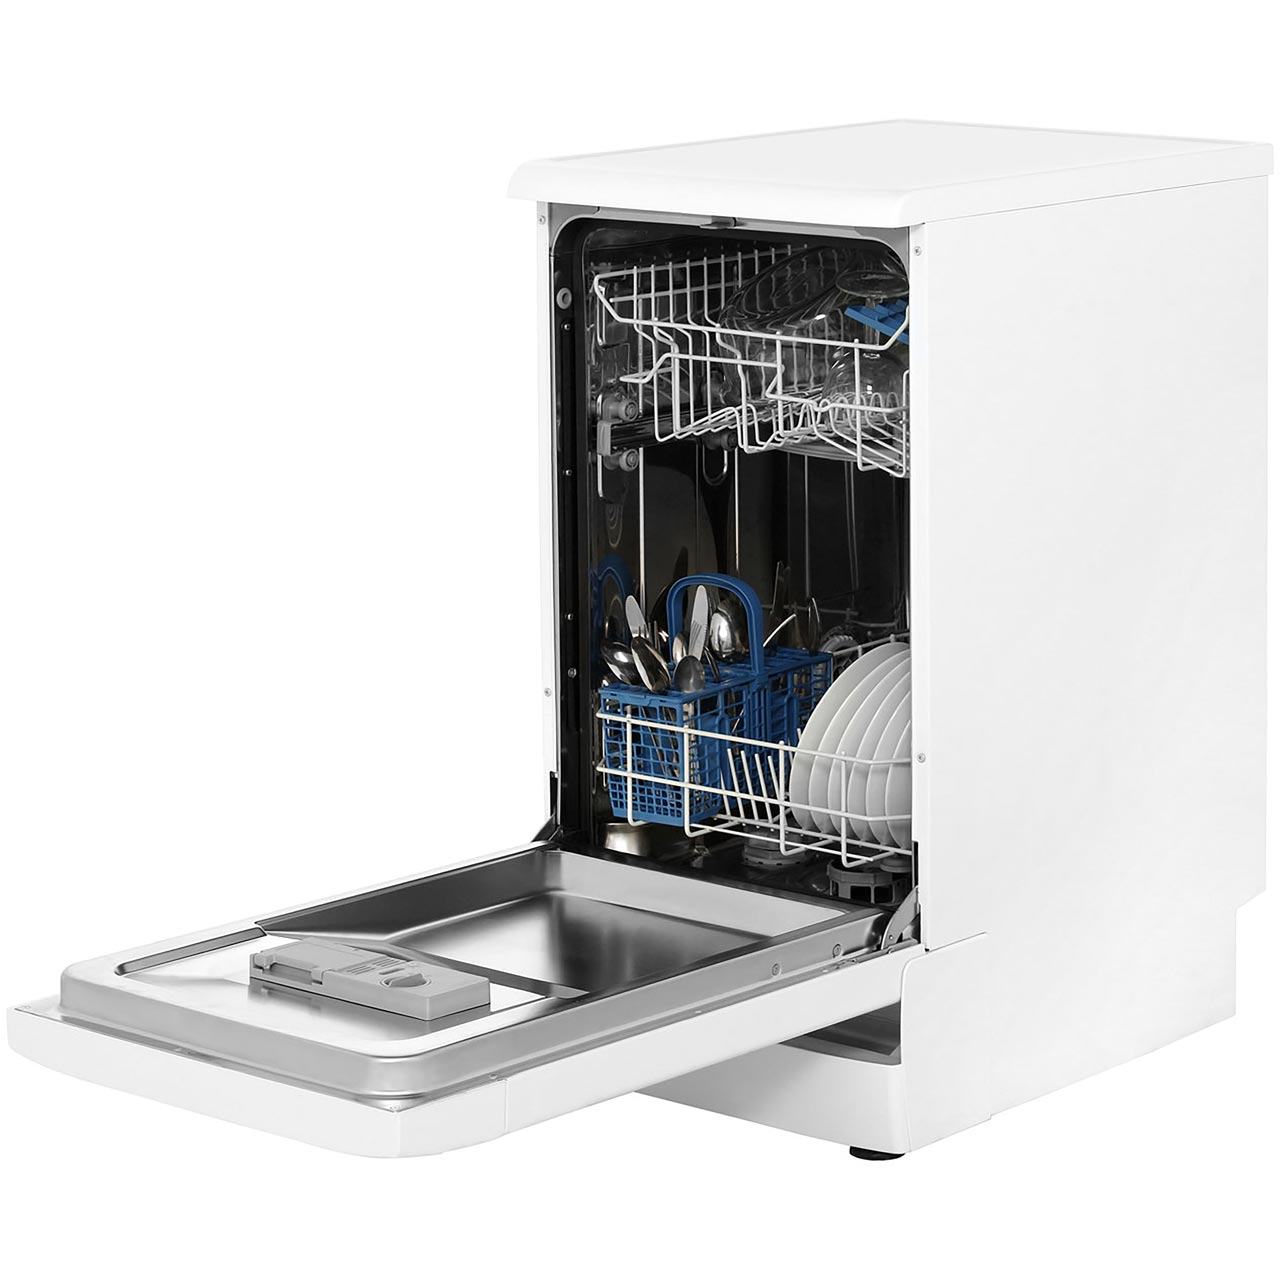 Small Dish Washer Dsr57b1 Wh Indesit Slimline Dishwasher Aocom